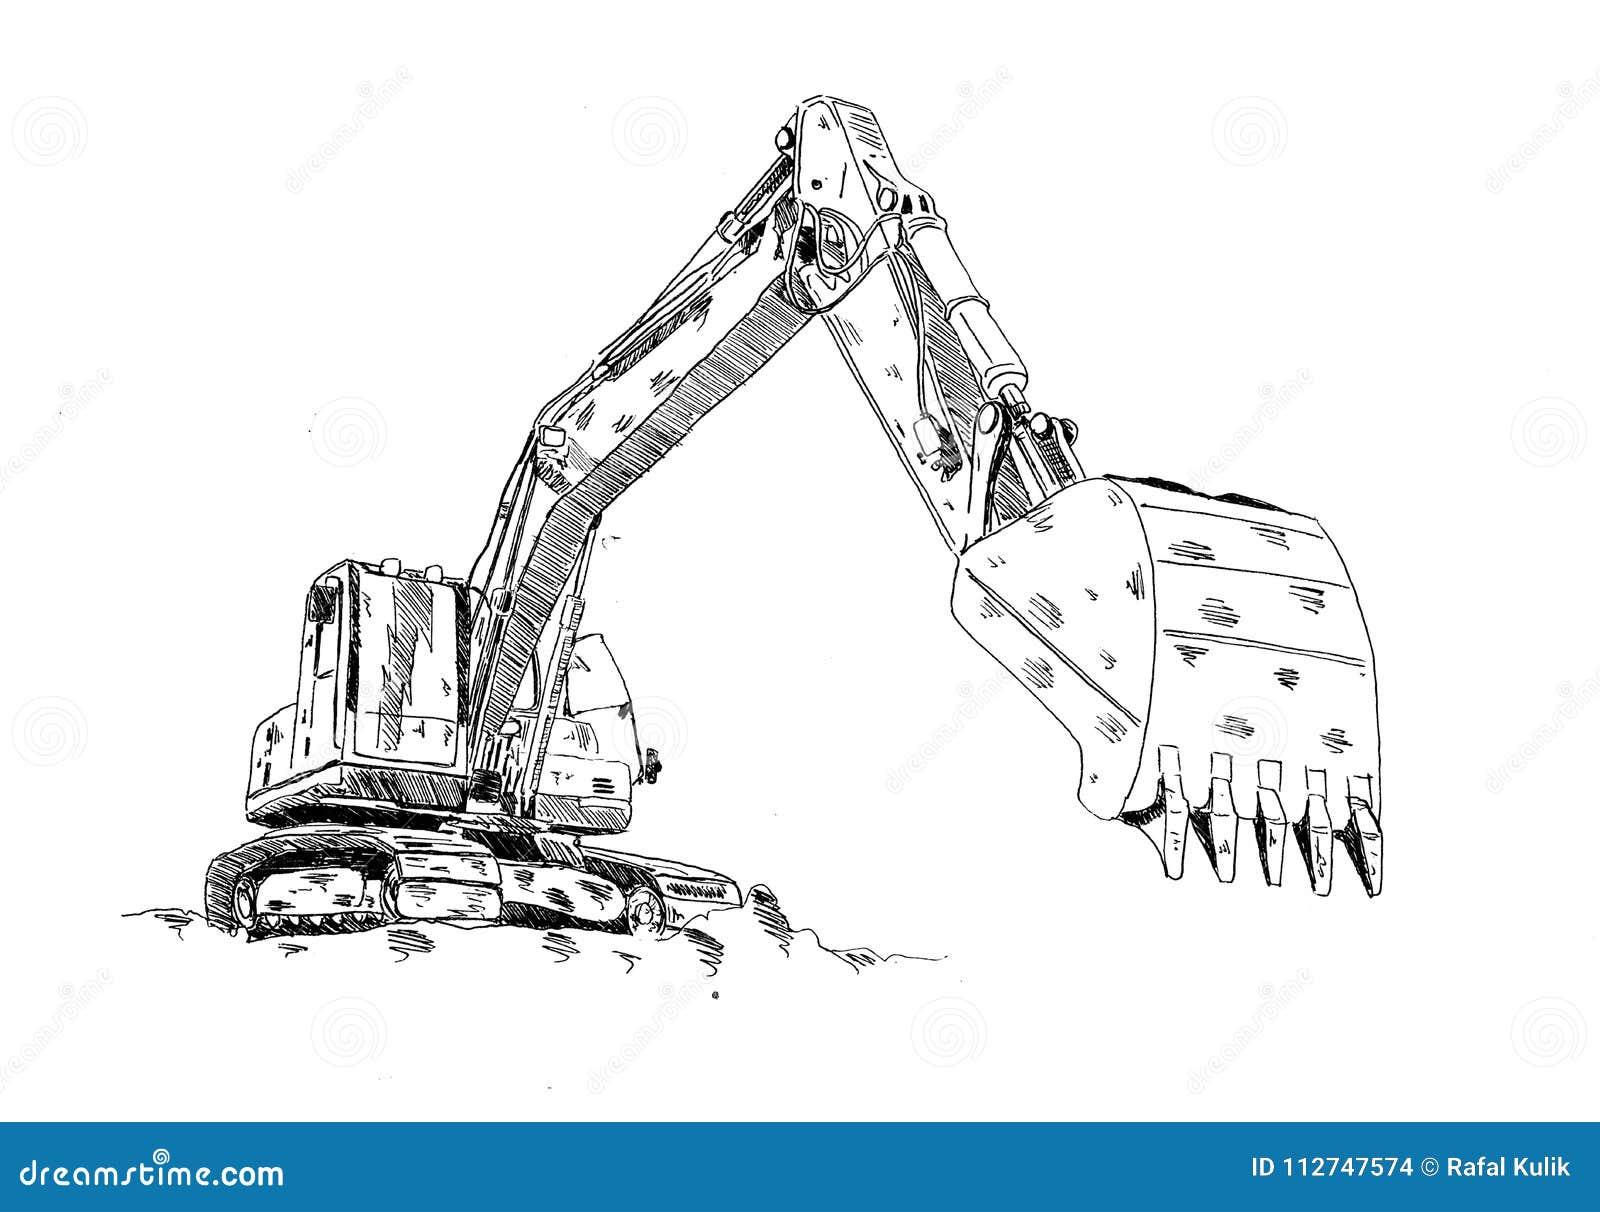 Excavator Illustration Art Work Drawing Fun Sketch Stock